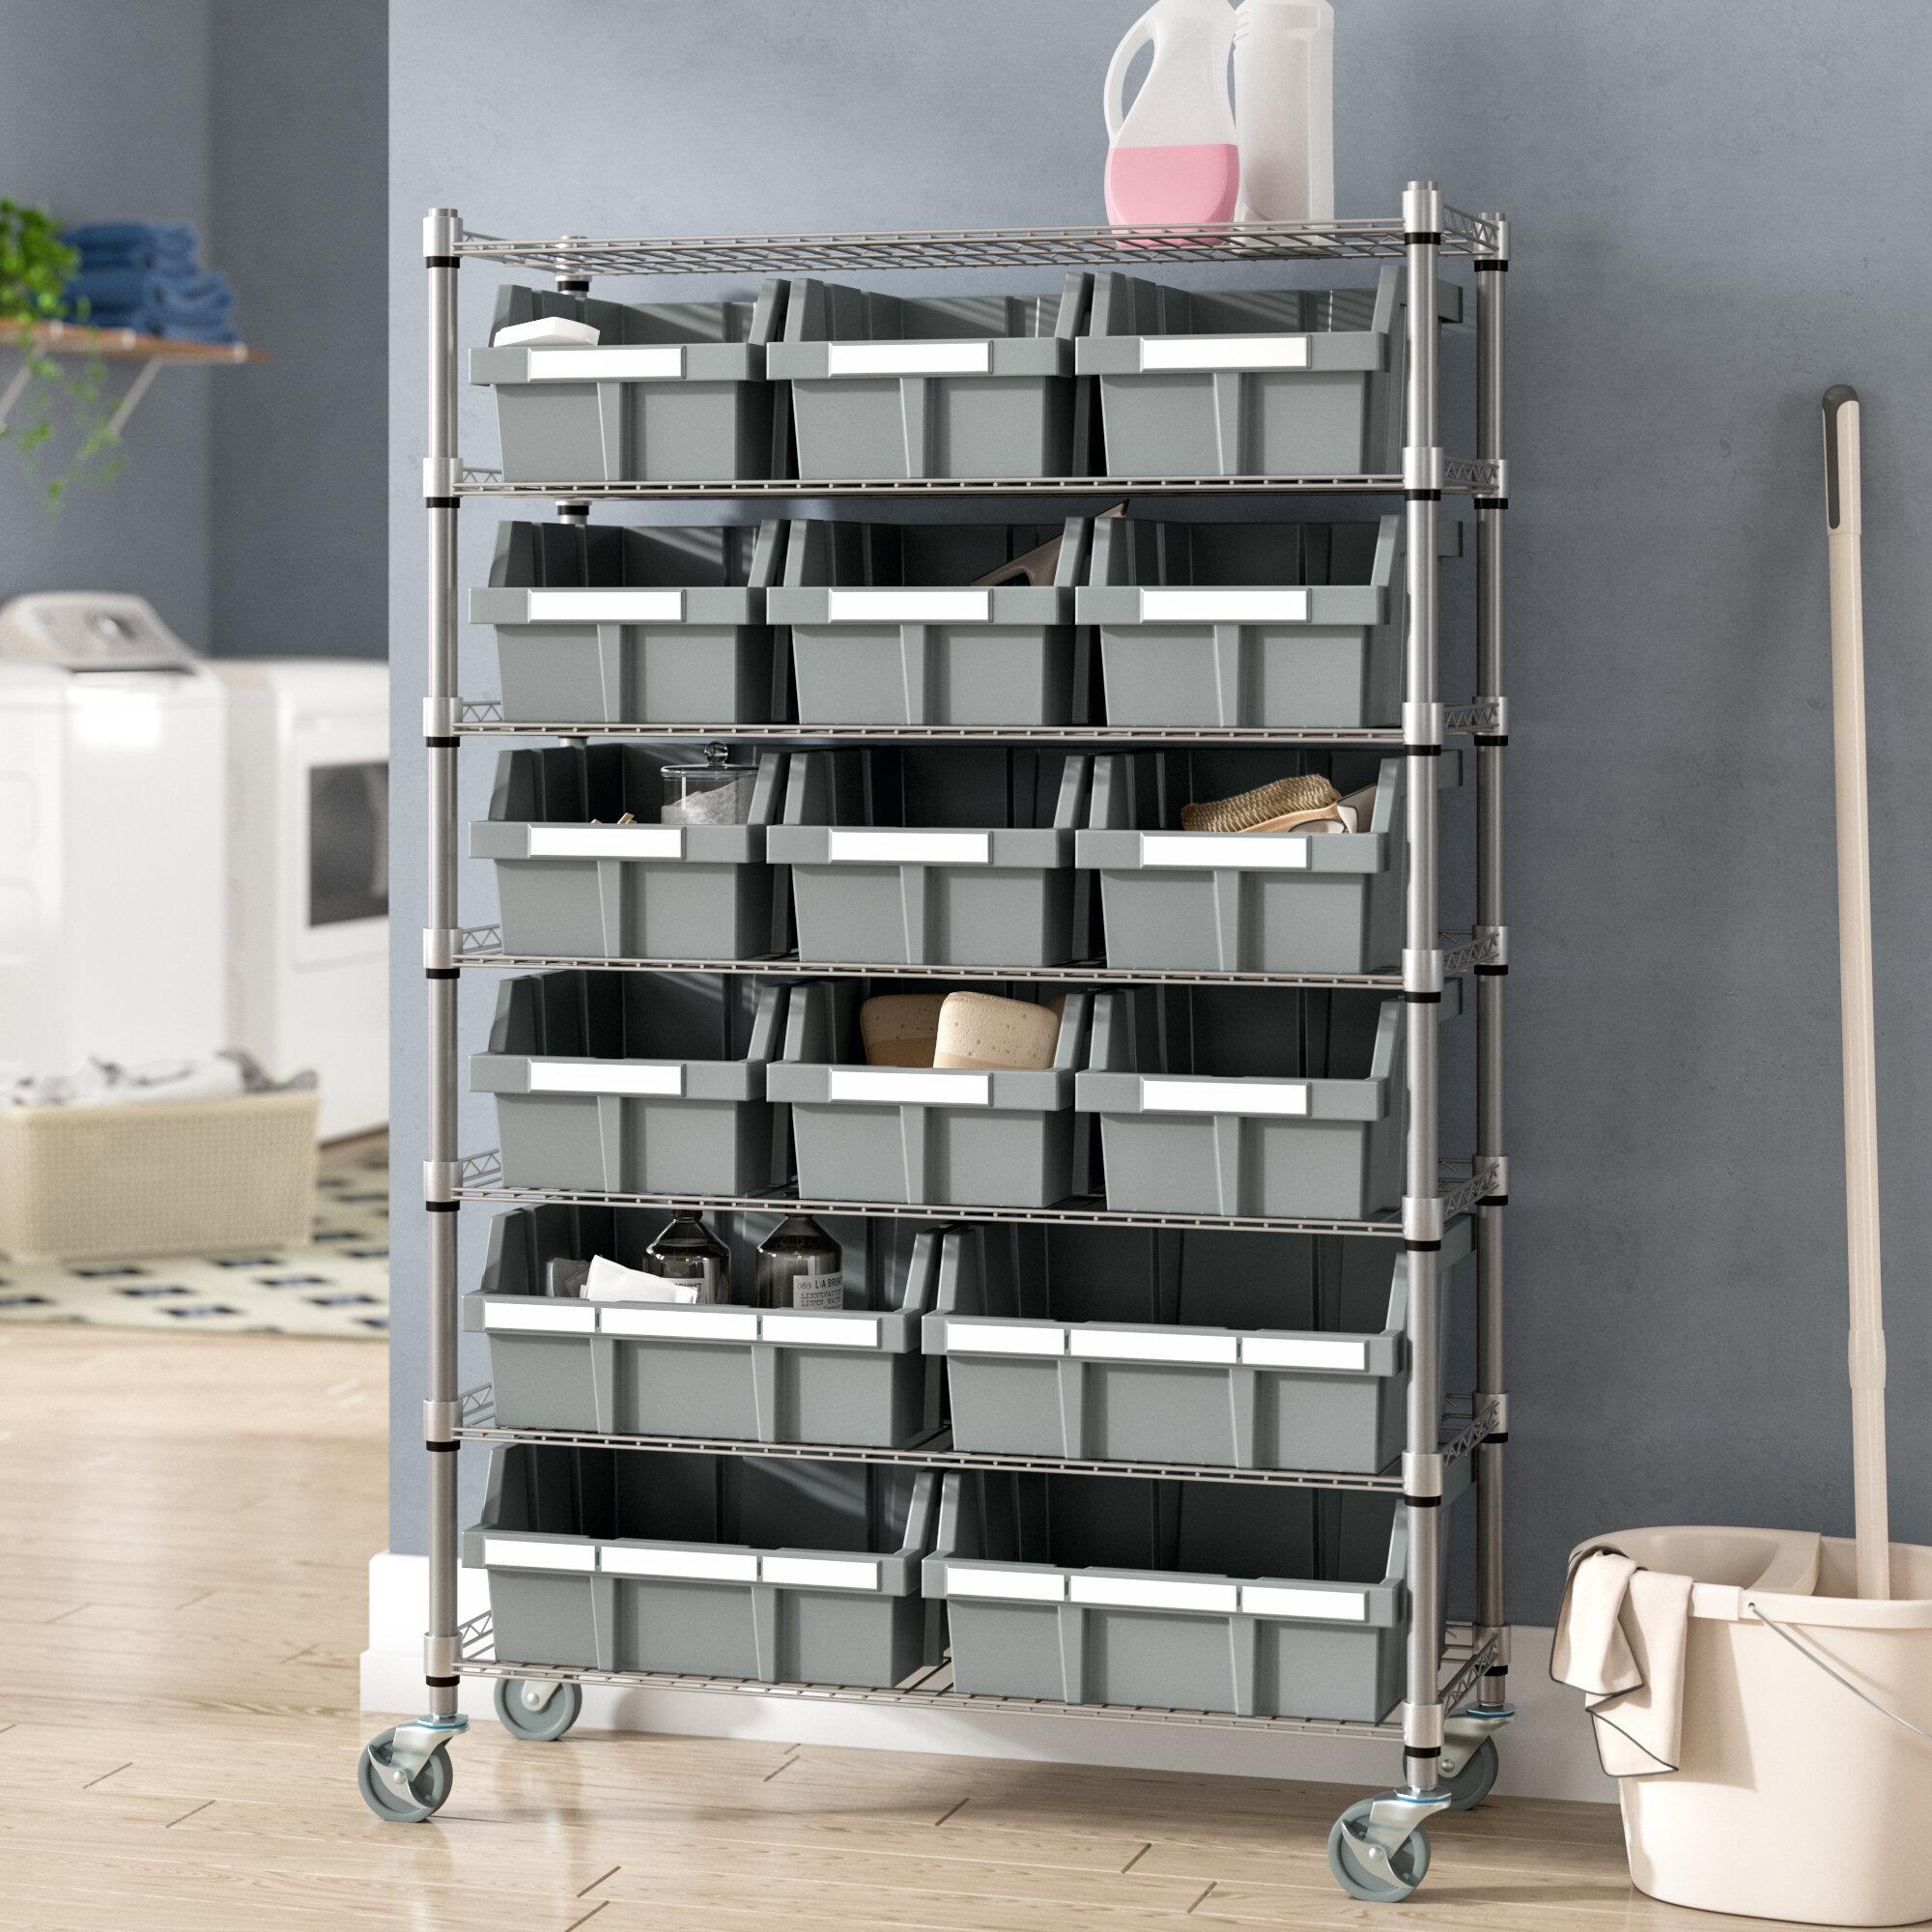 Rebrilliant 56 H X 36 W Deep Commercial Storage System